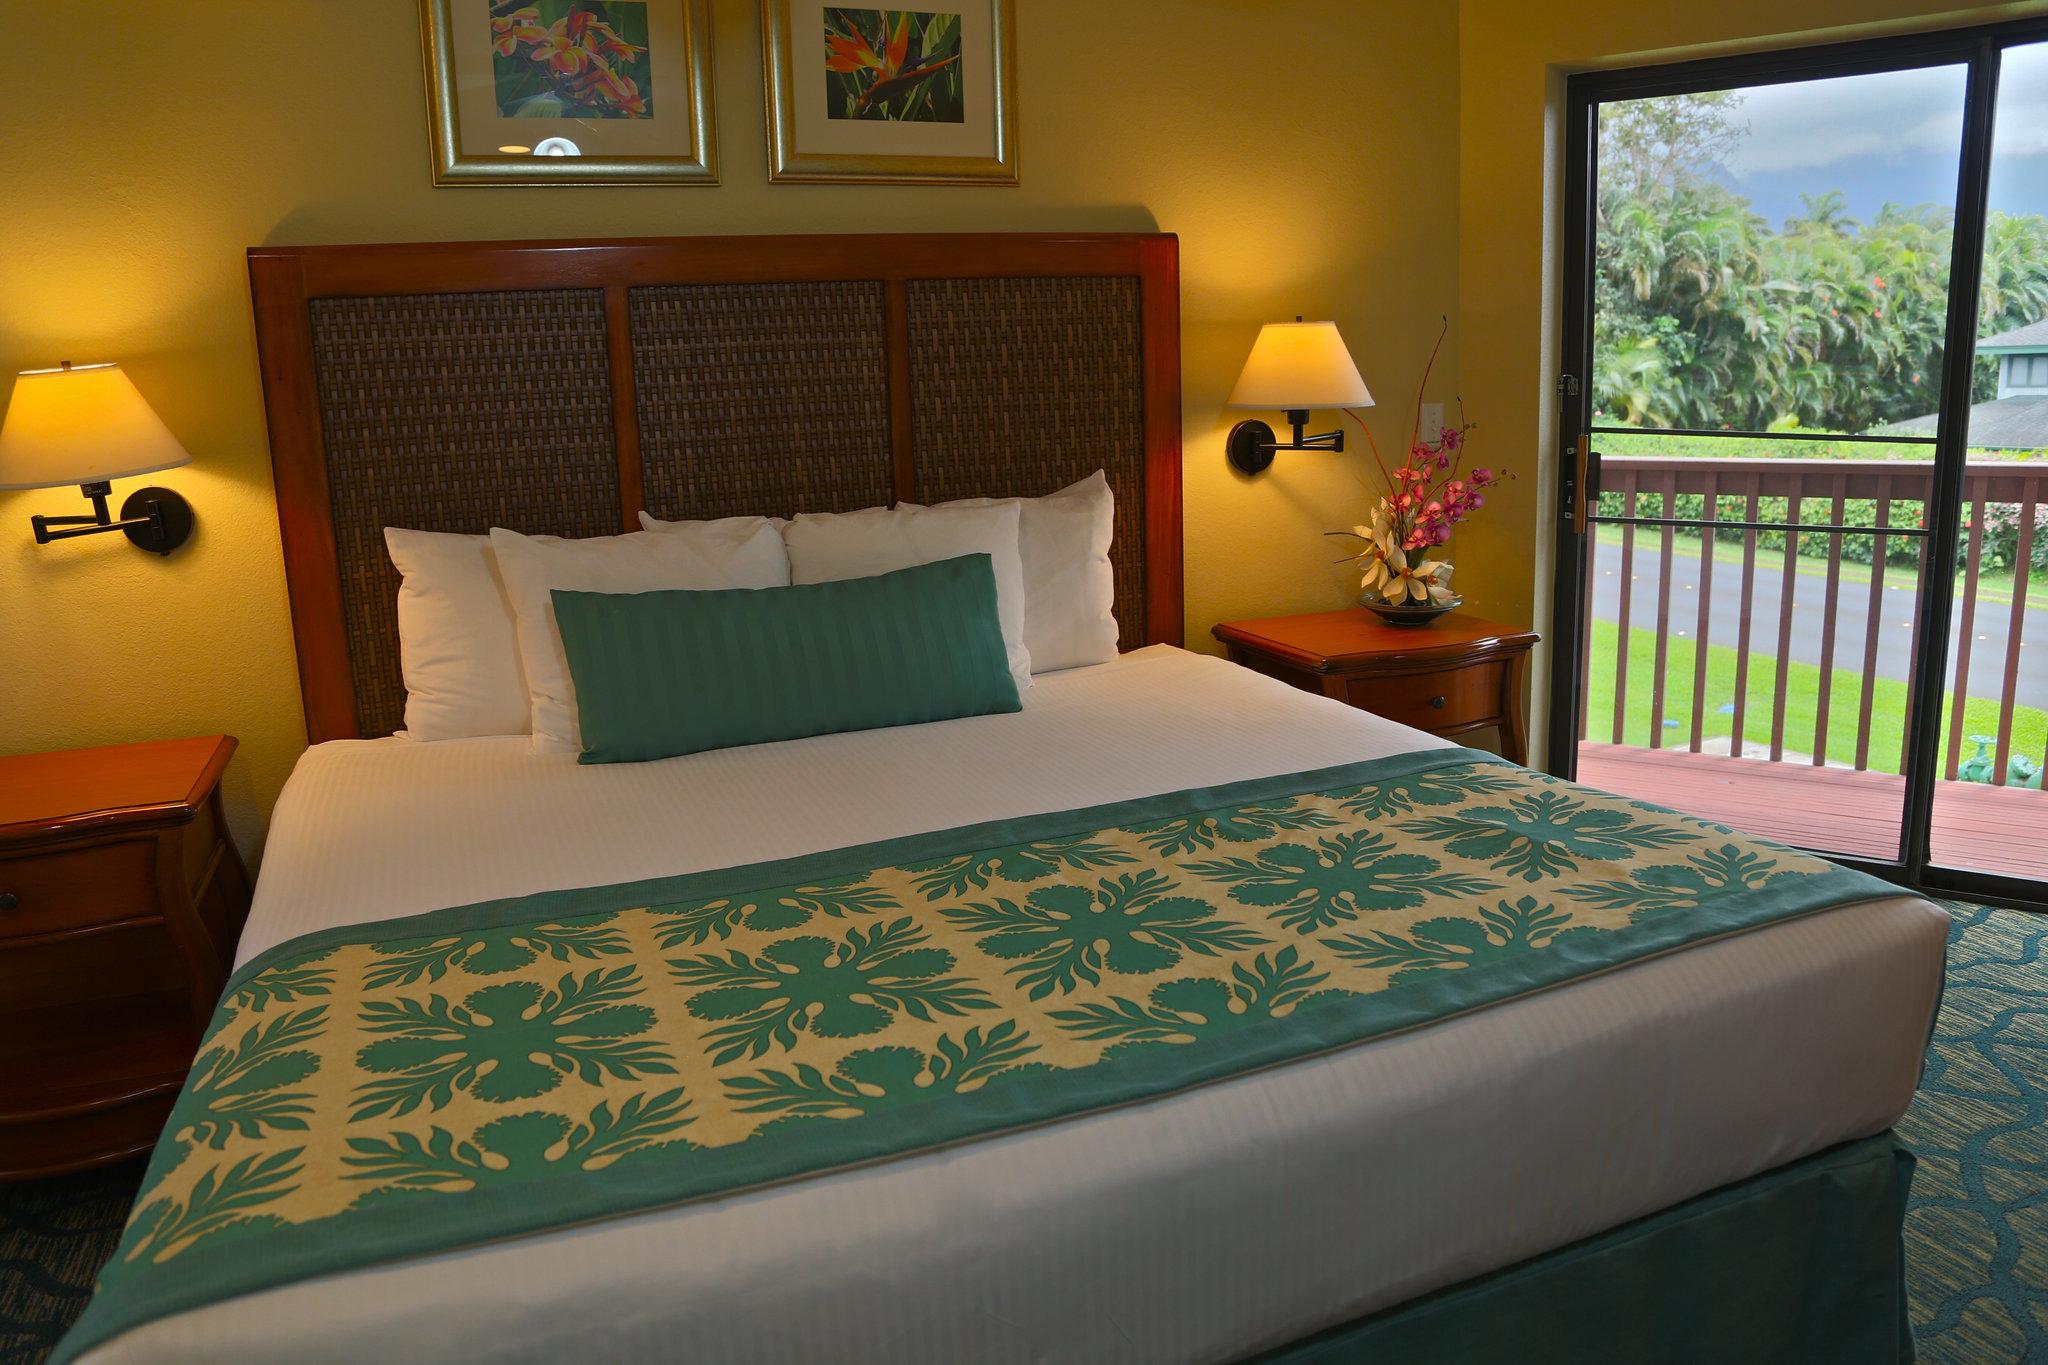 Apartment Ka Eo Kai 1 Bedroom 1 Bathroom photo 20365841